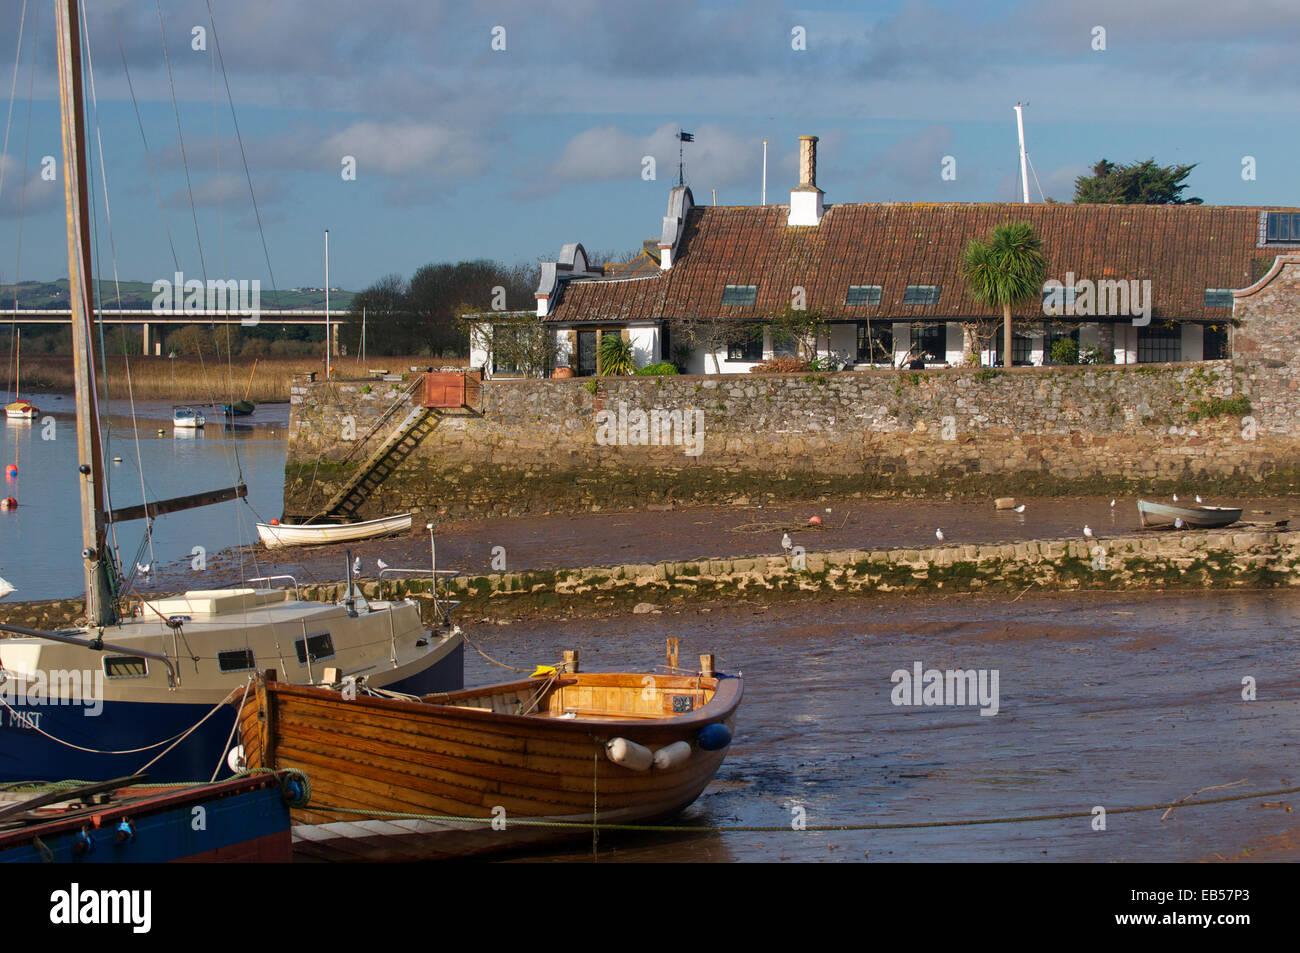 The River Exe at Topsham, Devon, UK - Stock Image